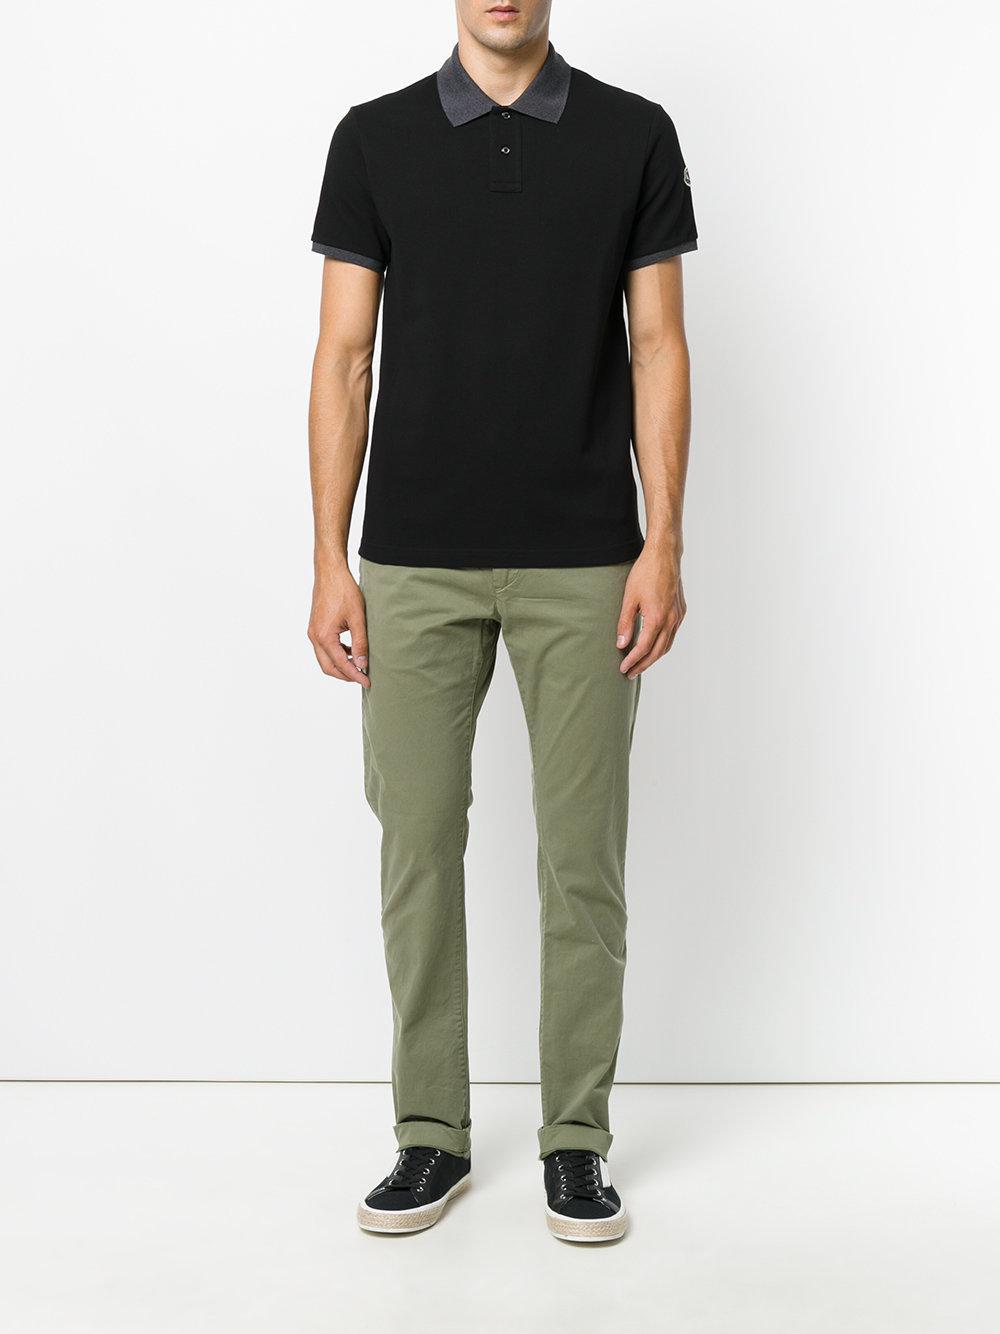 5728172bb1ea Lyst - Moncler Contrast Trim Polo Shirt in Black for Men